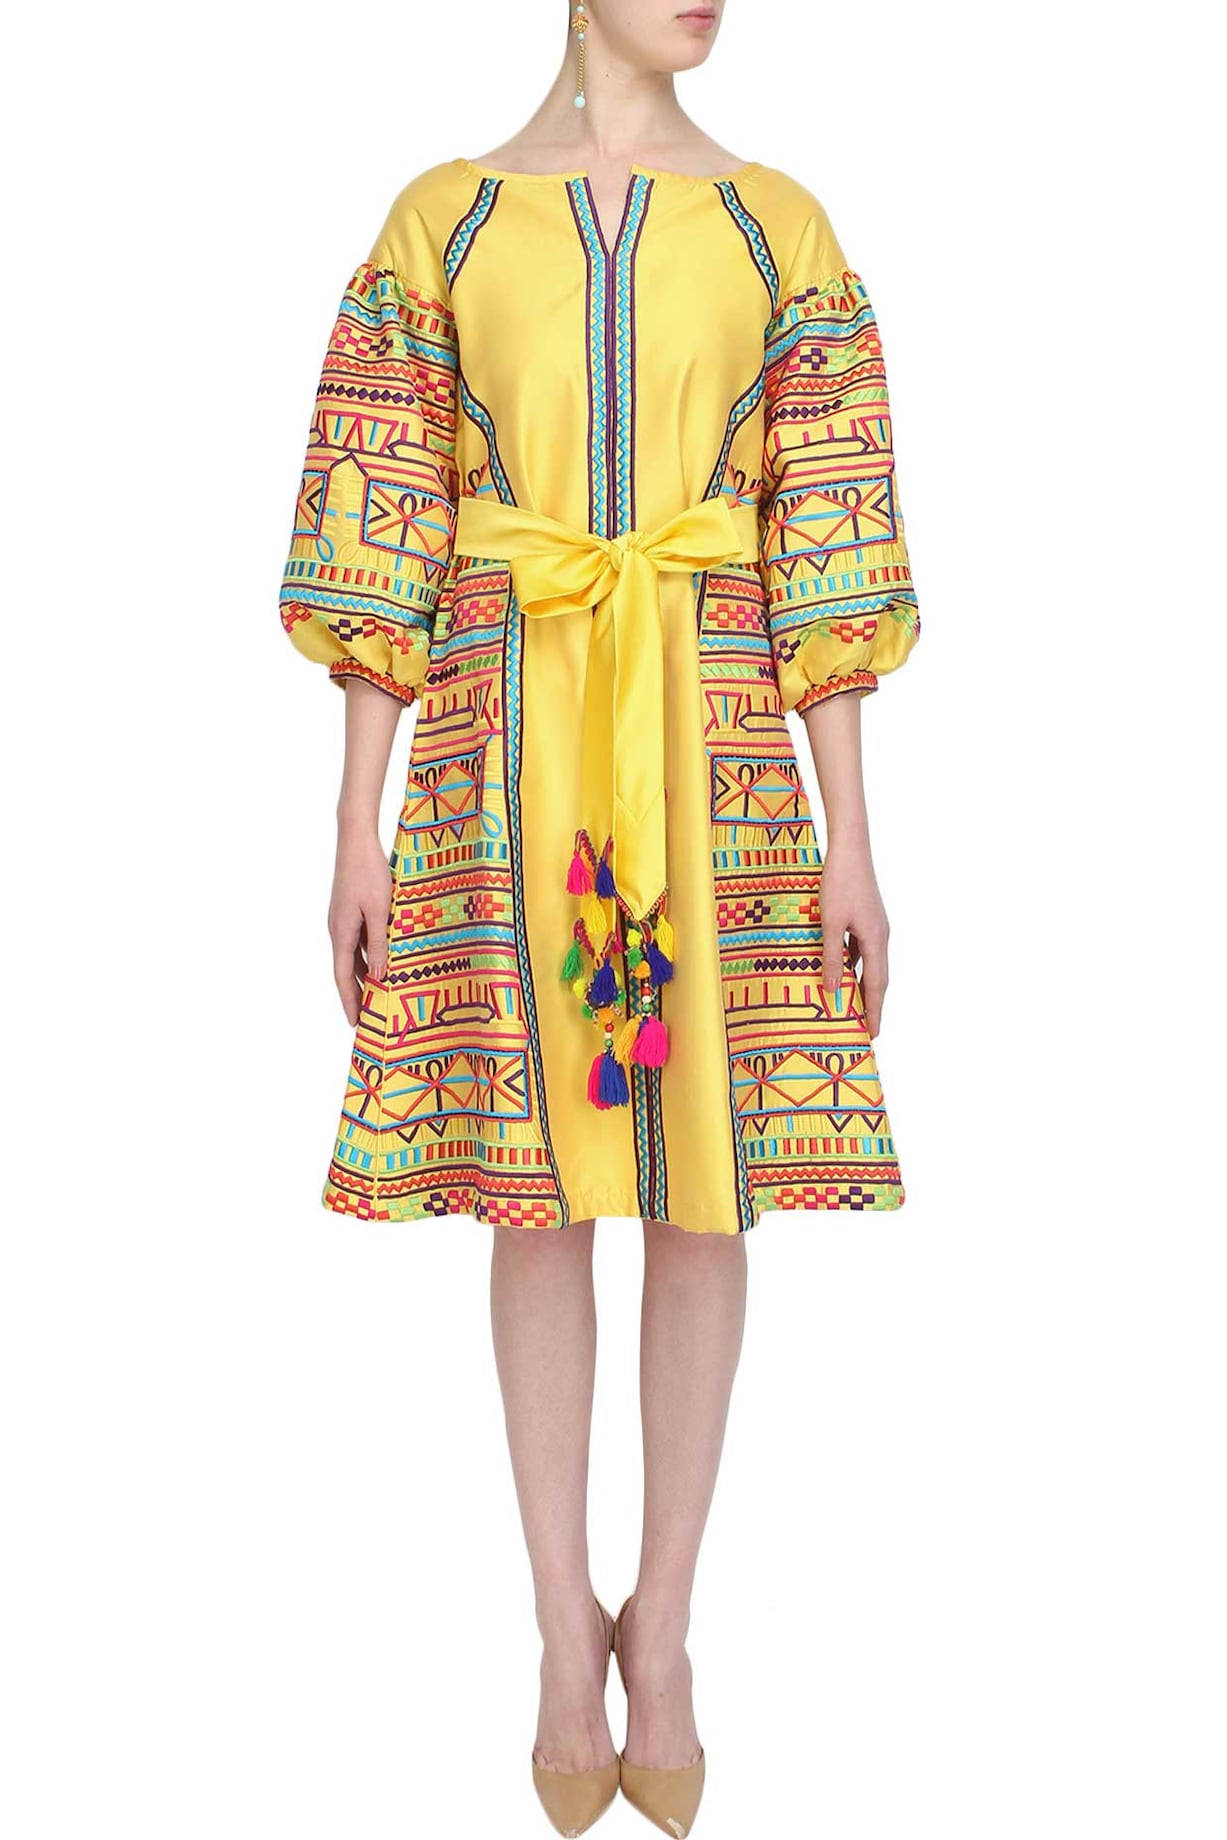 Mynah Designs By Reynu Tandon Dresses